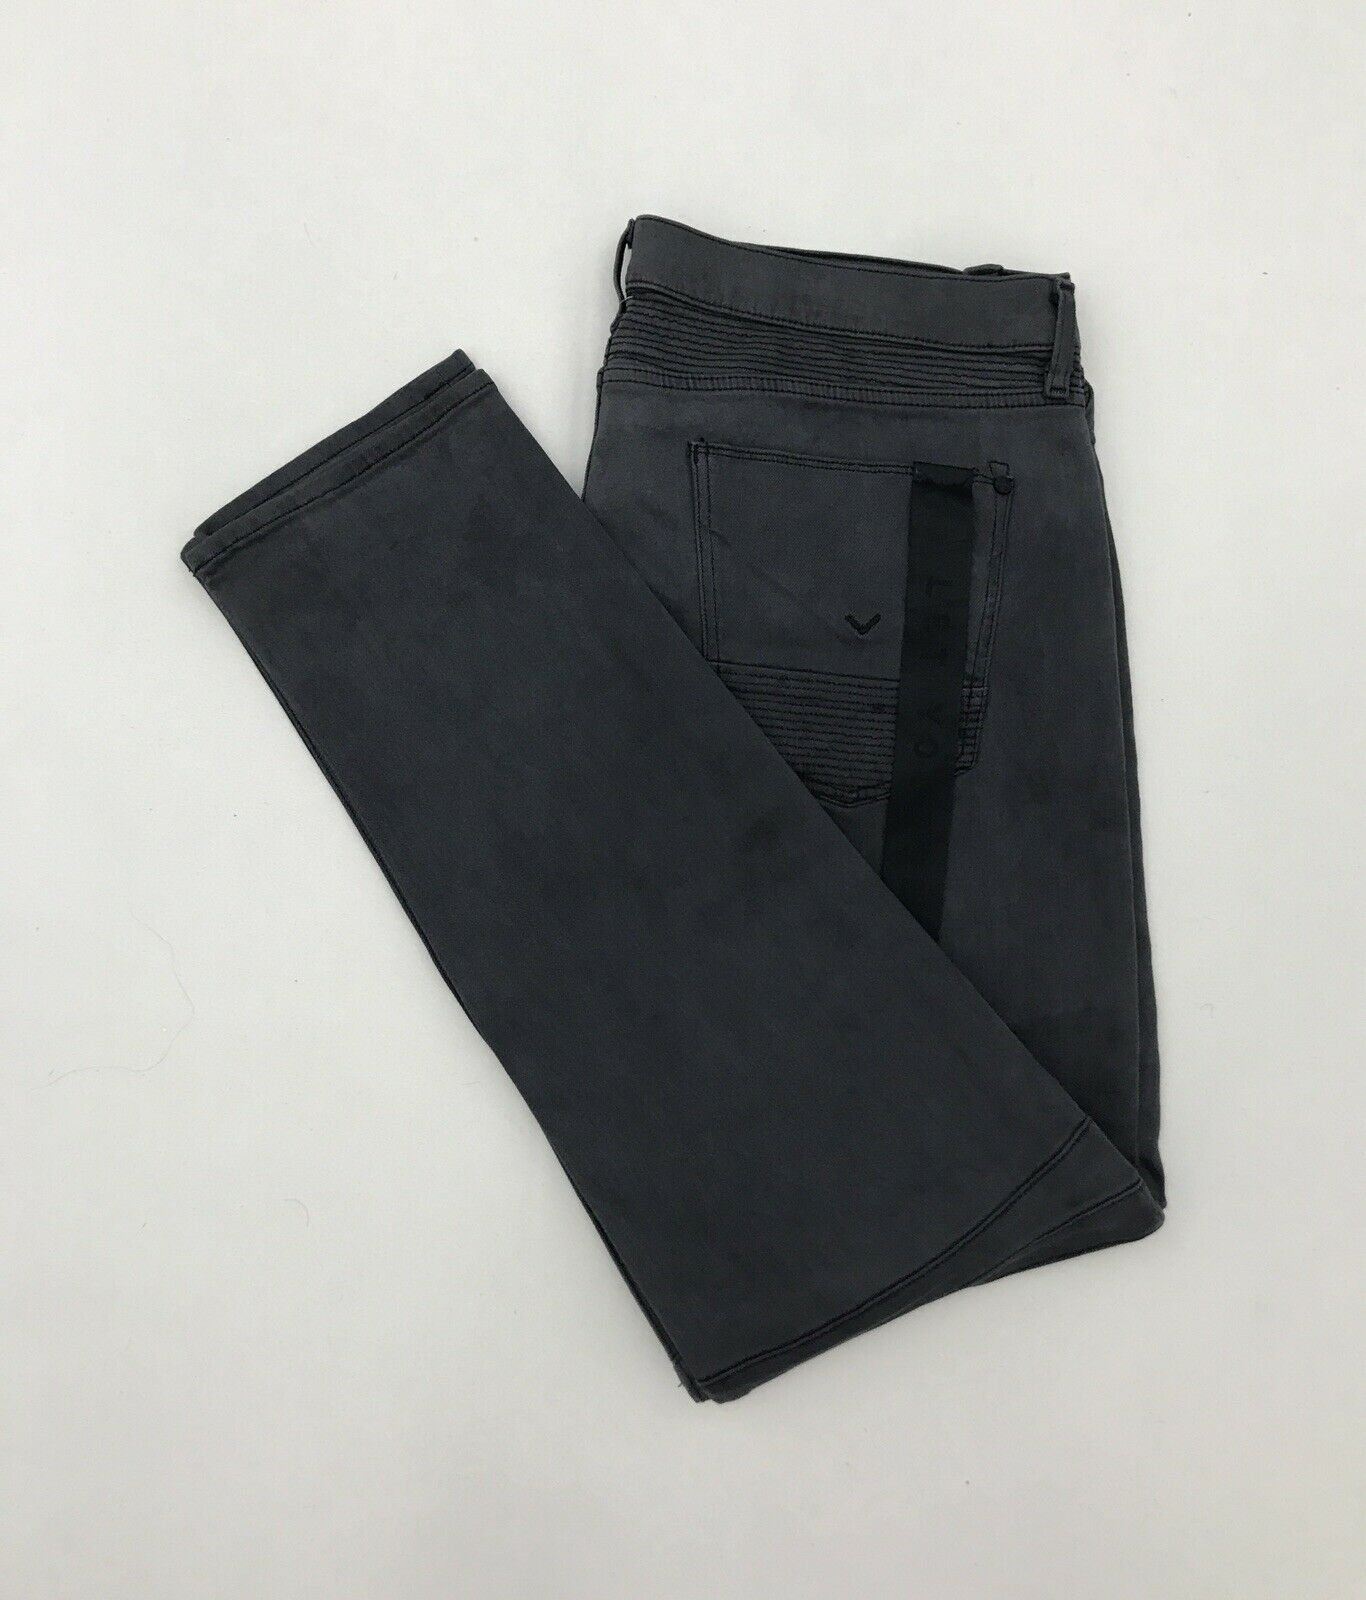 NWT Size 40X34 Men's HUDSON The Blinder Biker Skinny Stretch Denim Moto Jeans